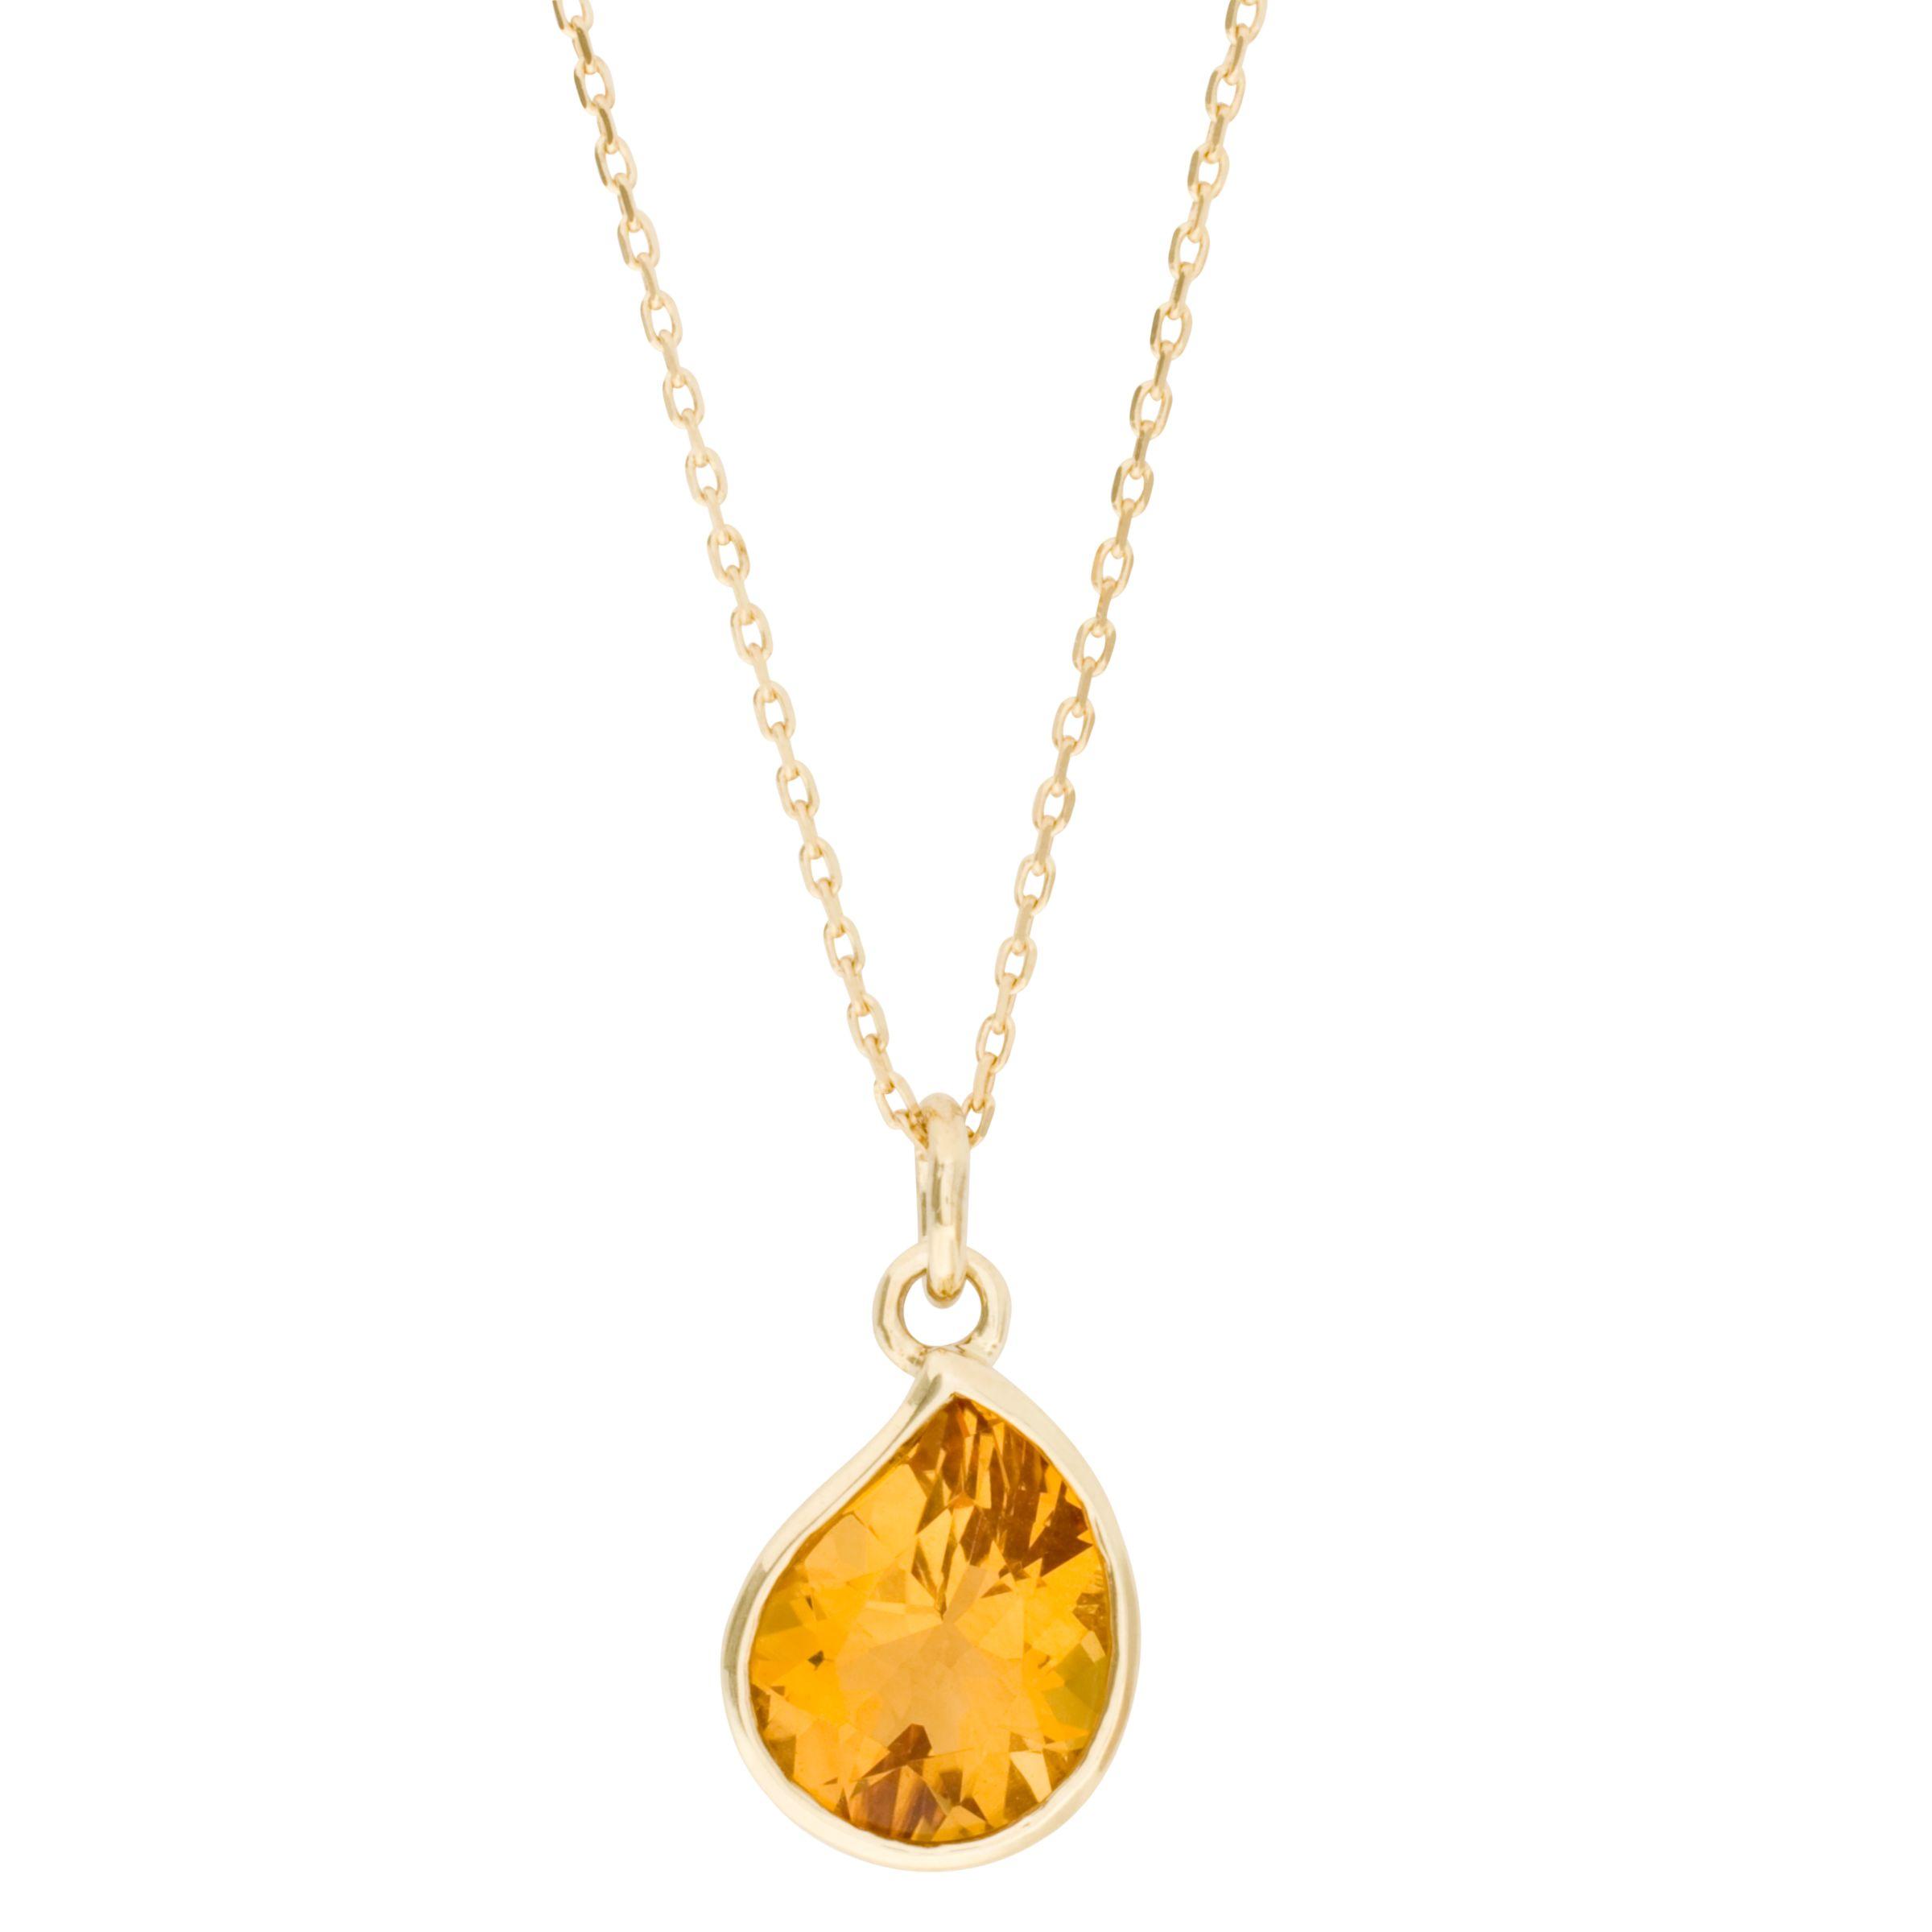 London Road Gold Citrine Pendant Necklace